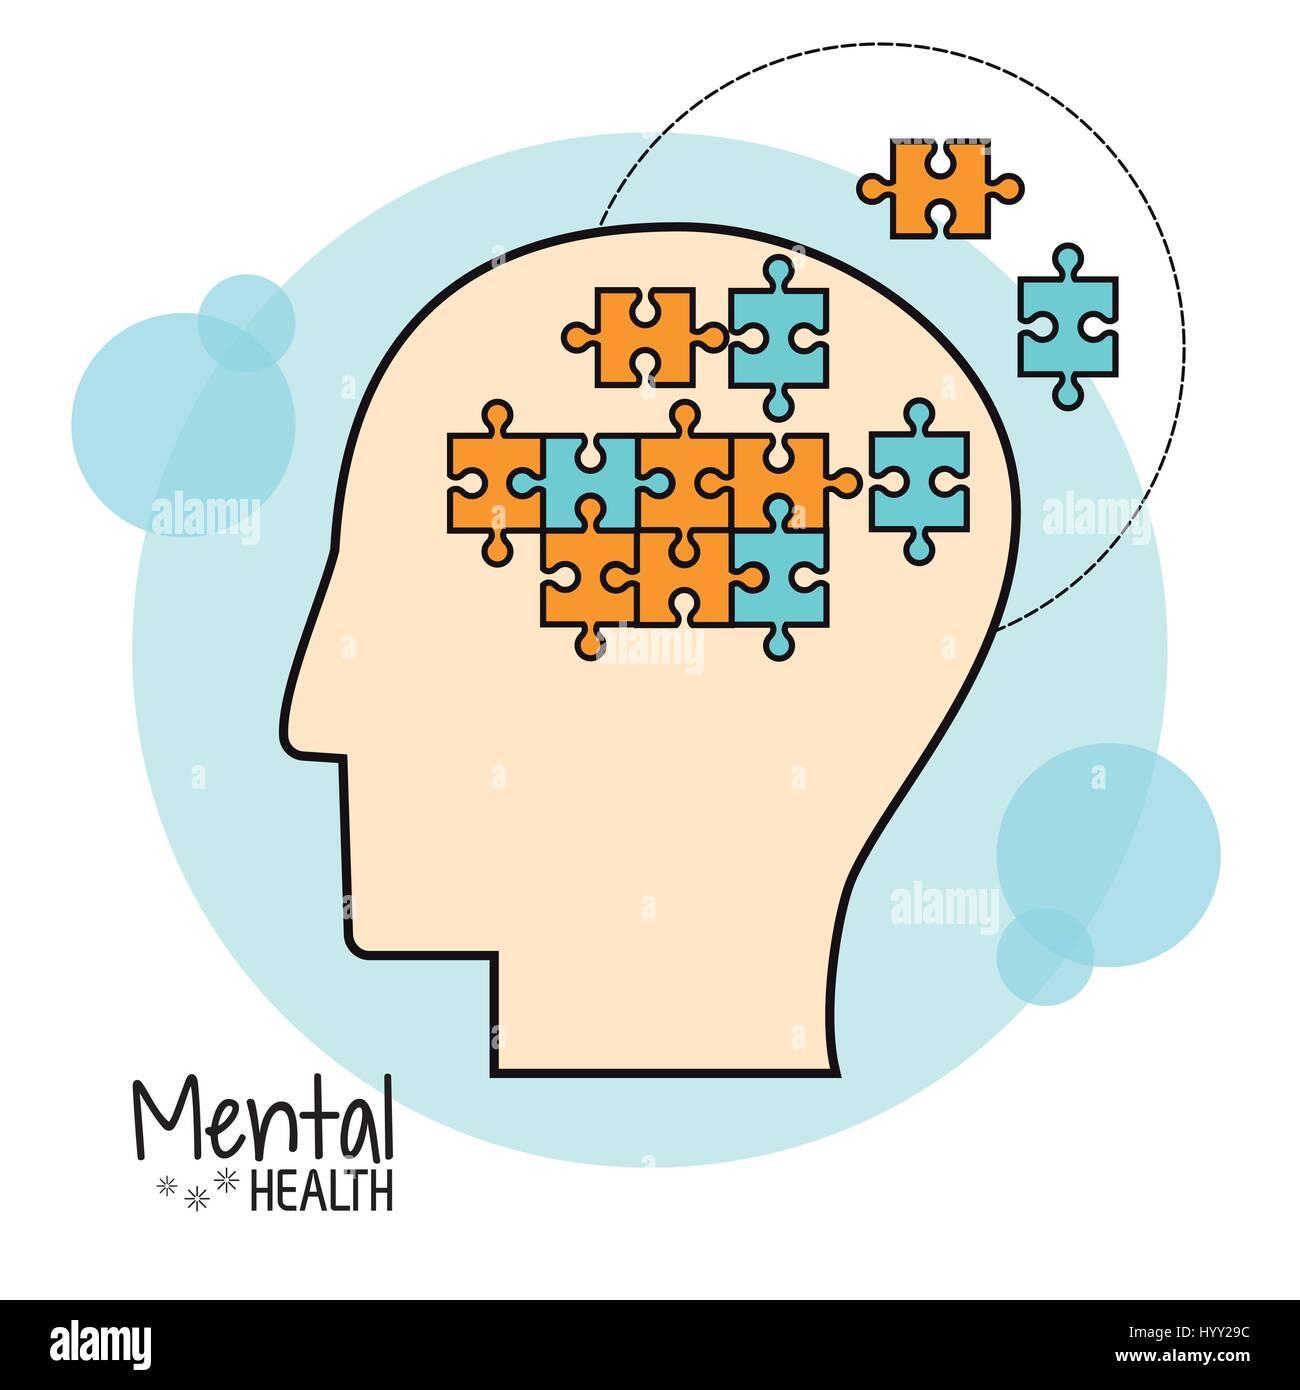 mental health brain puzzle image Stock Vector